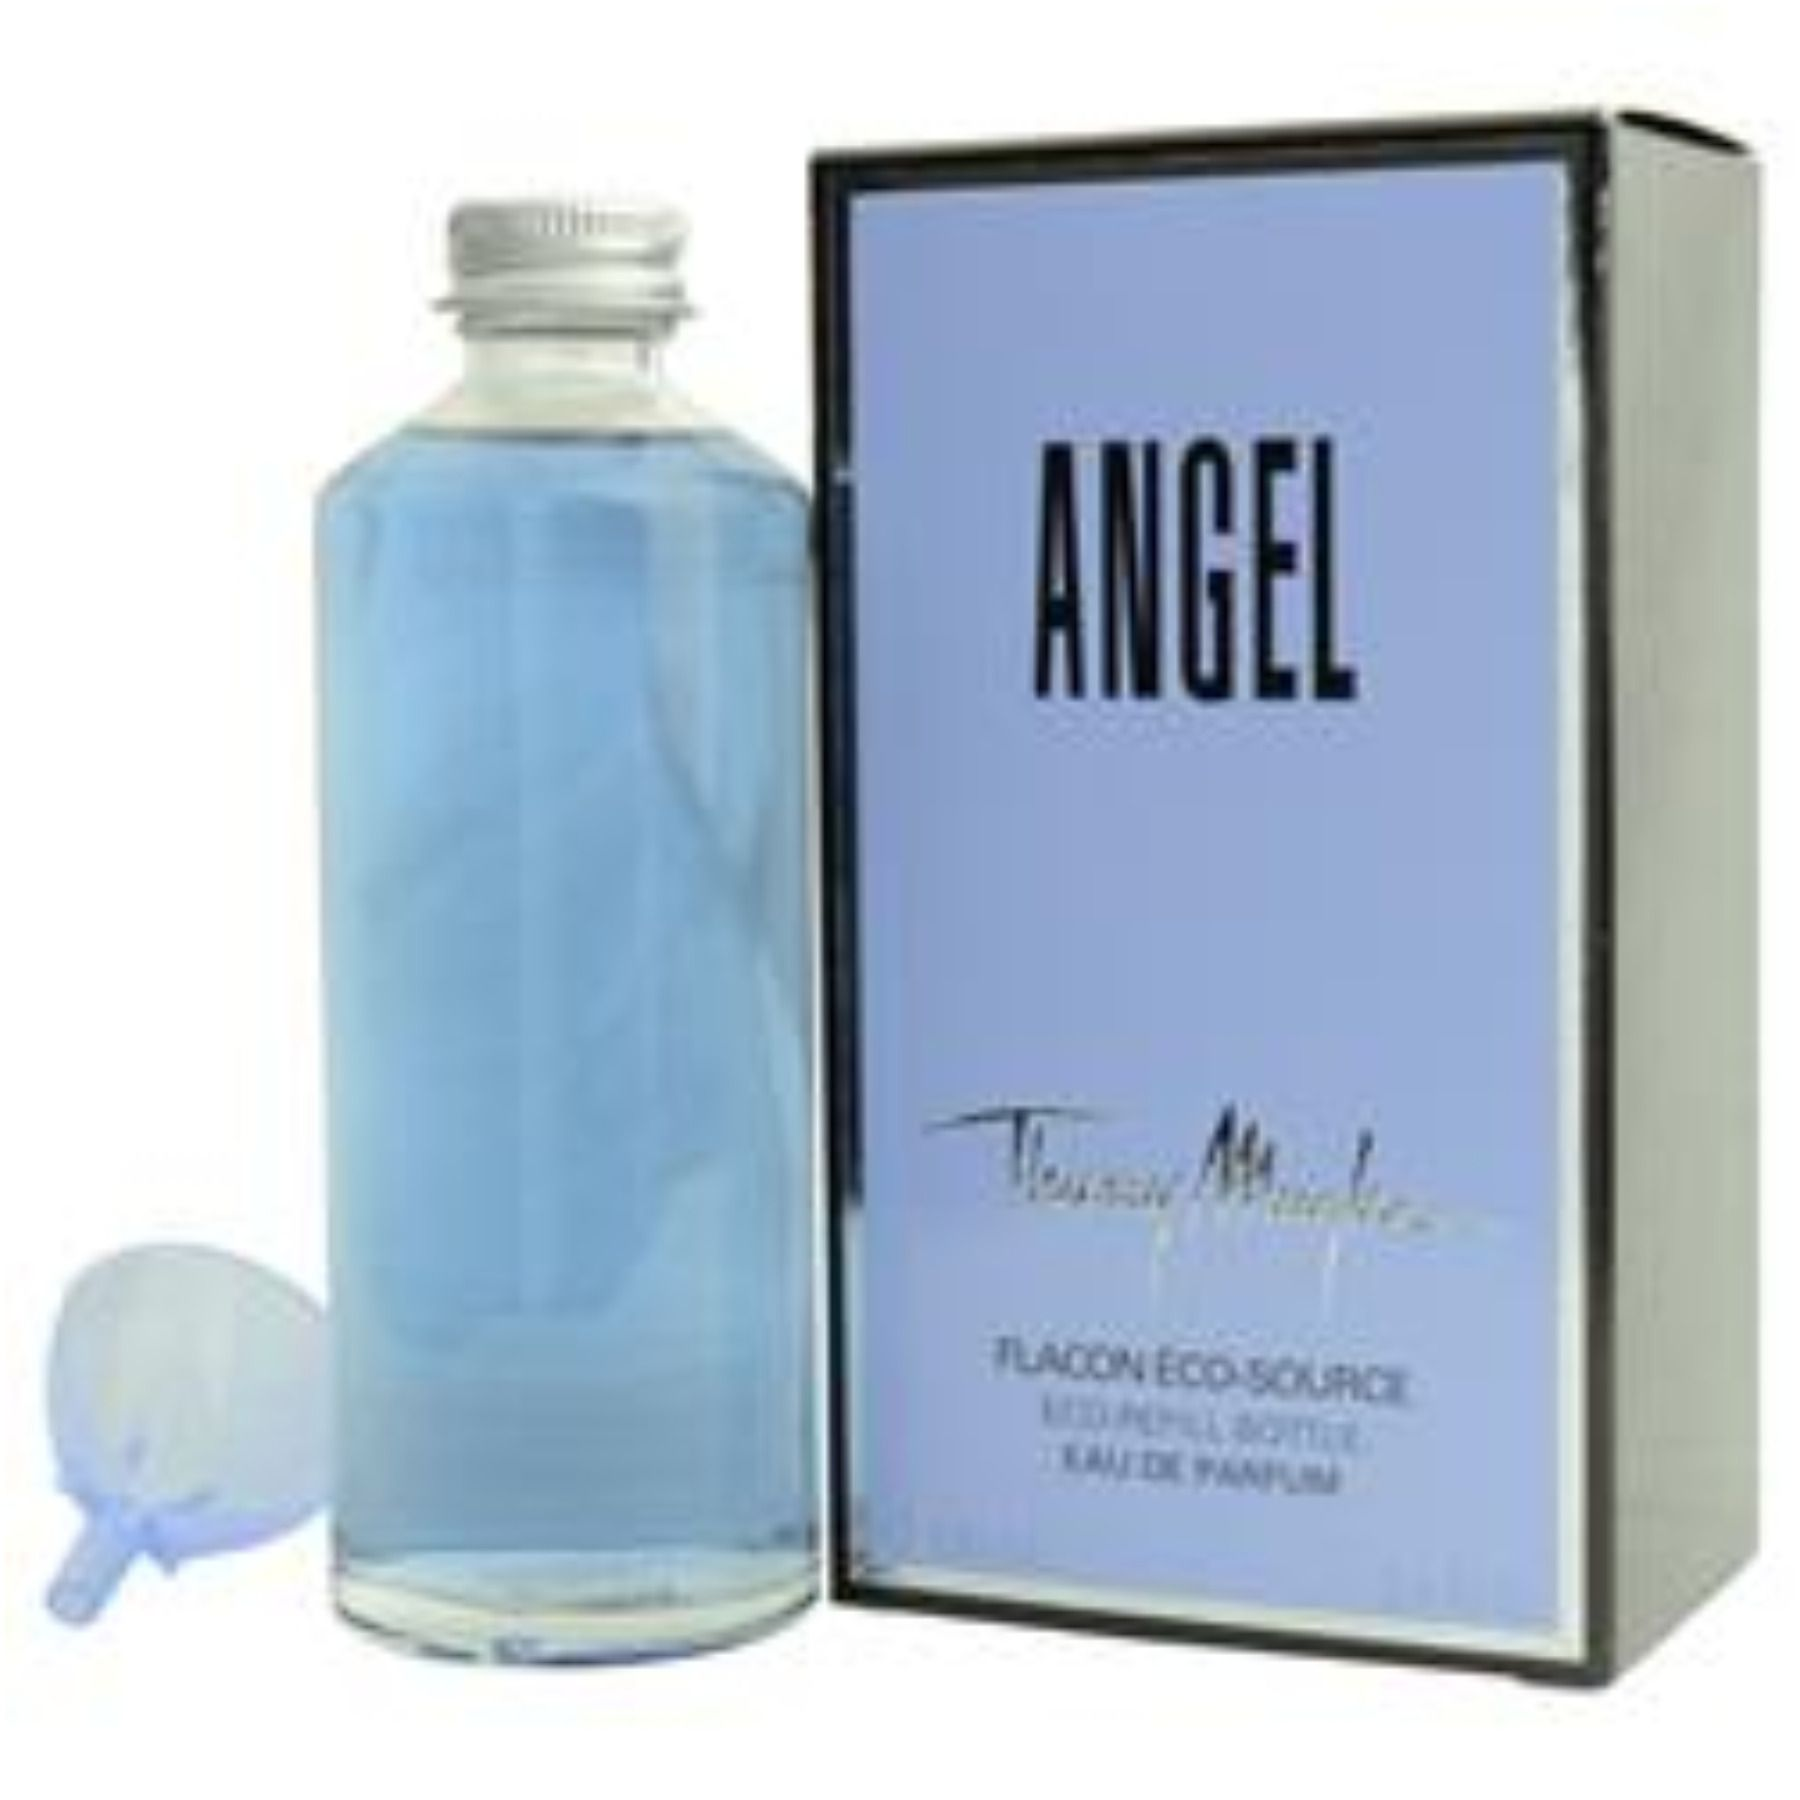 Angel By Thierry Mugler Eau De Parfum Refill 3 4 Oz Eau De Parfum